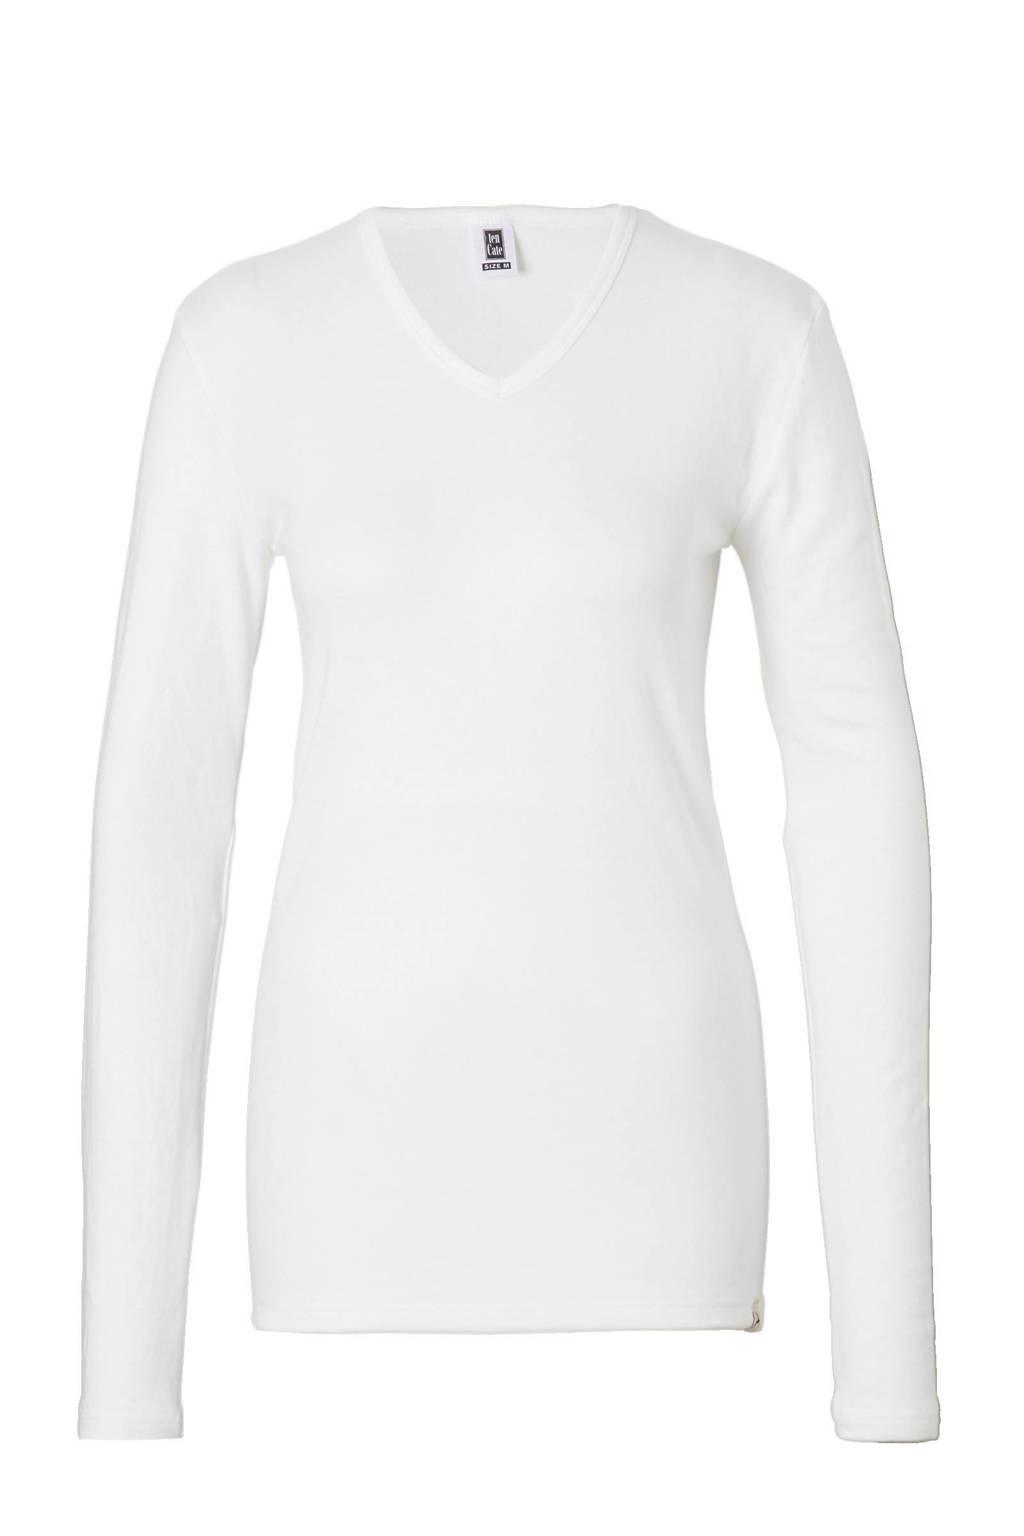 ten Cate thermo shirt wit, Ecru